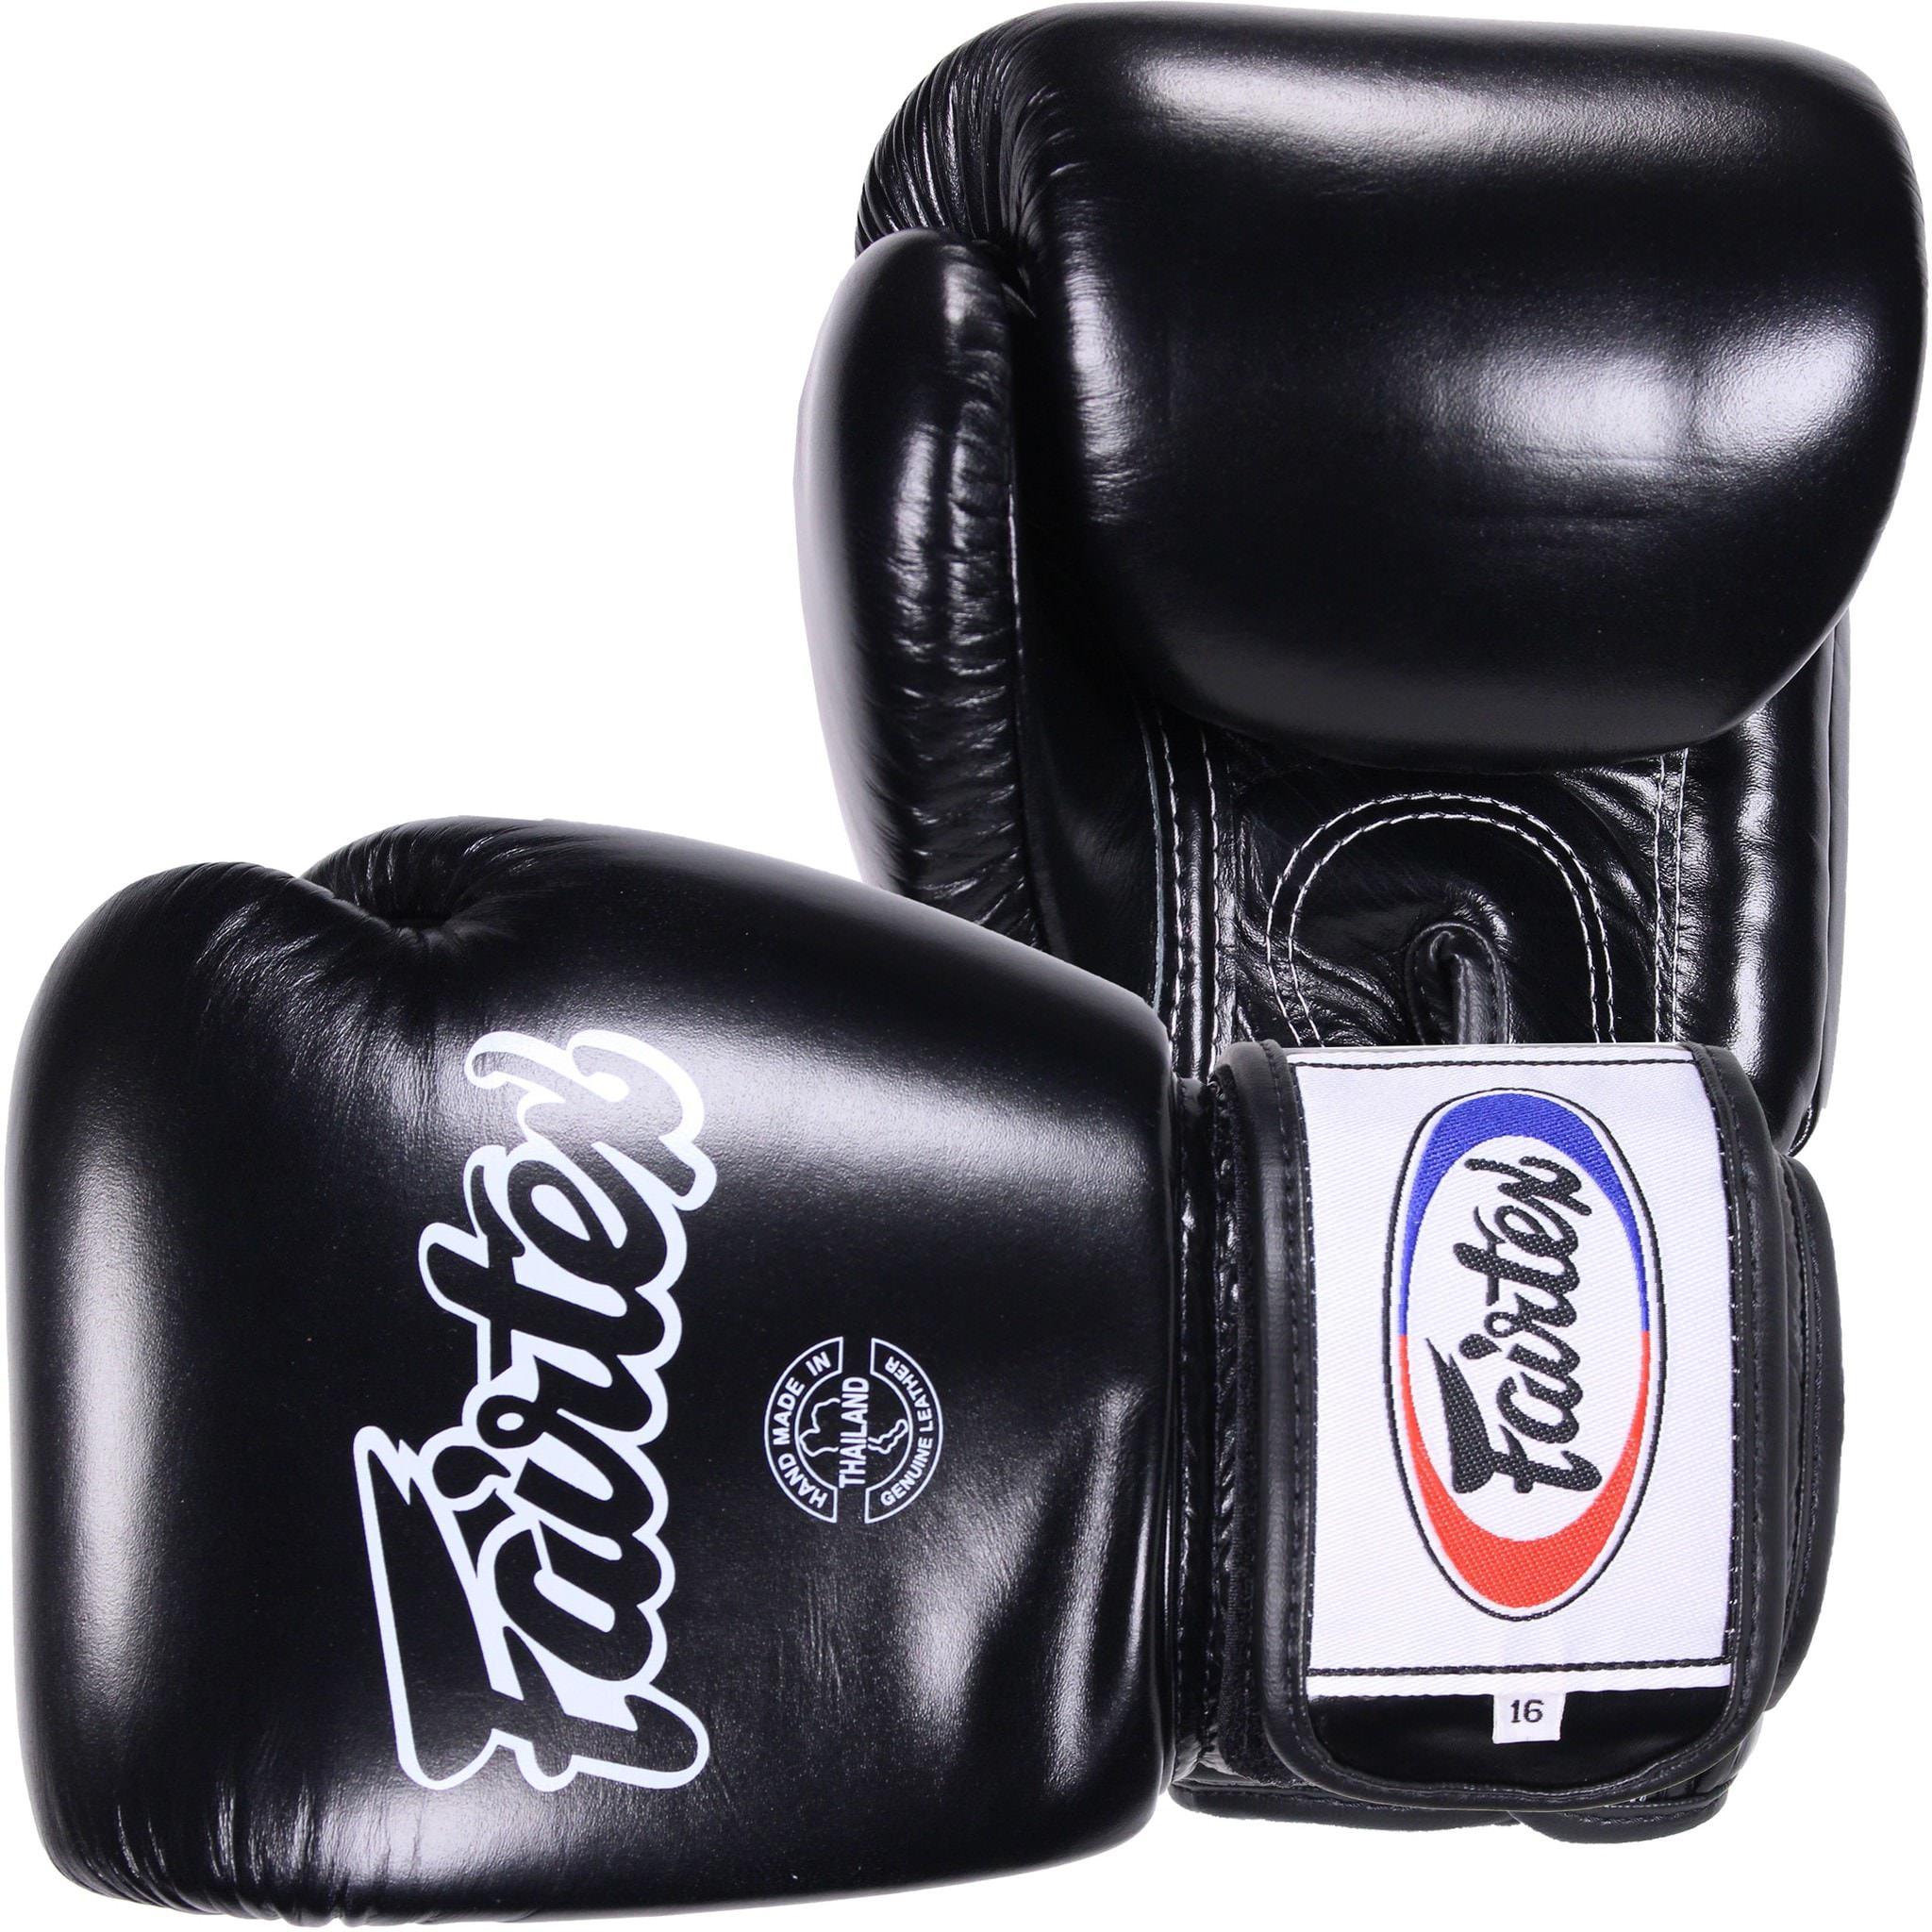 Guantes de Boxeo para Boxeo Color: Solid Negro Tama/ño: 12/14/16/oz bgv1-br Transpirable Guantes Kick Boxing Fairtex Muay Thai Guantes de Boxeo MMA Entrenamiento